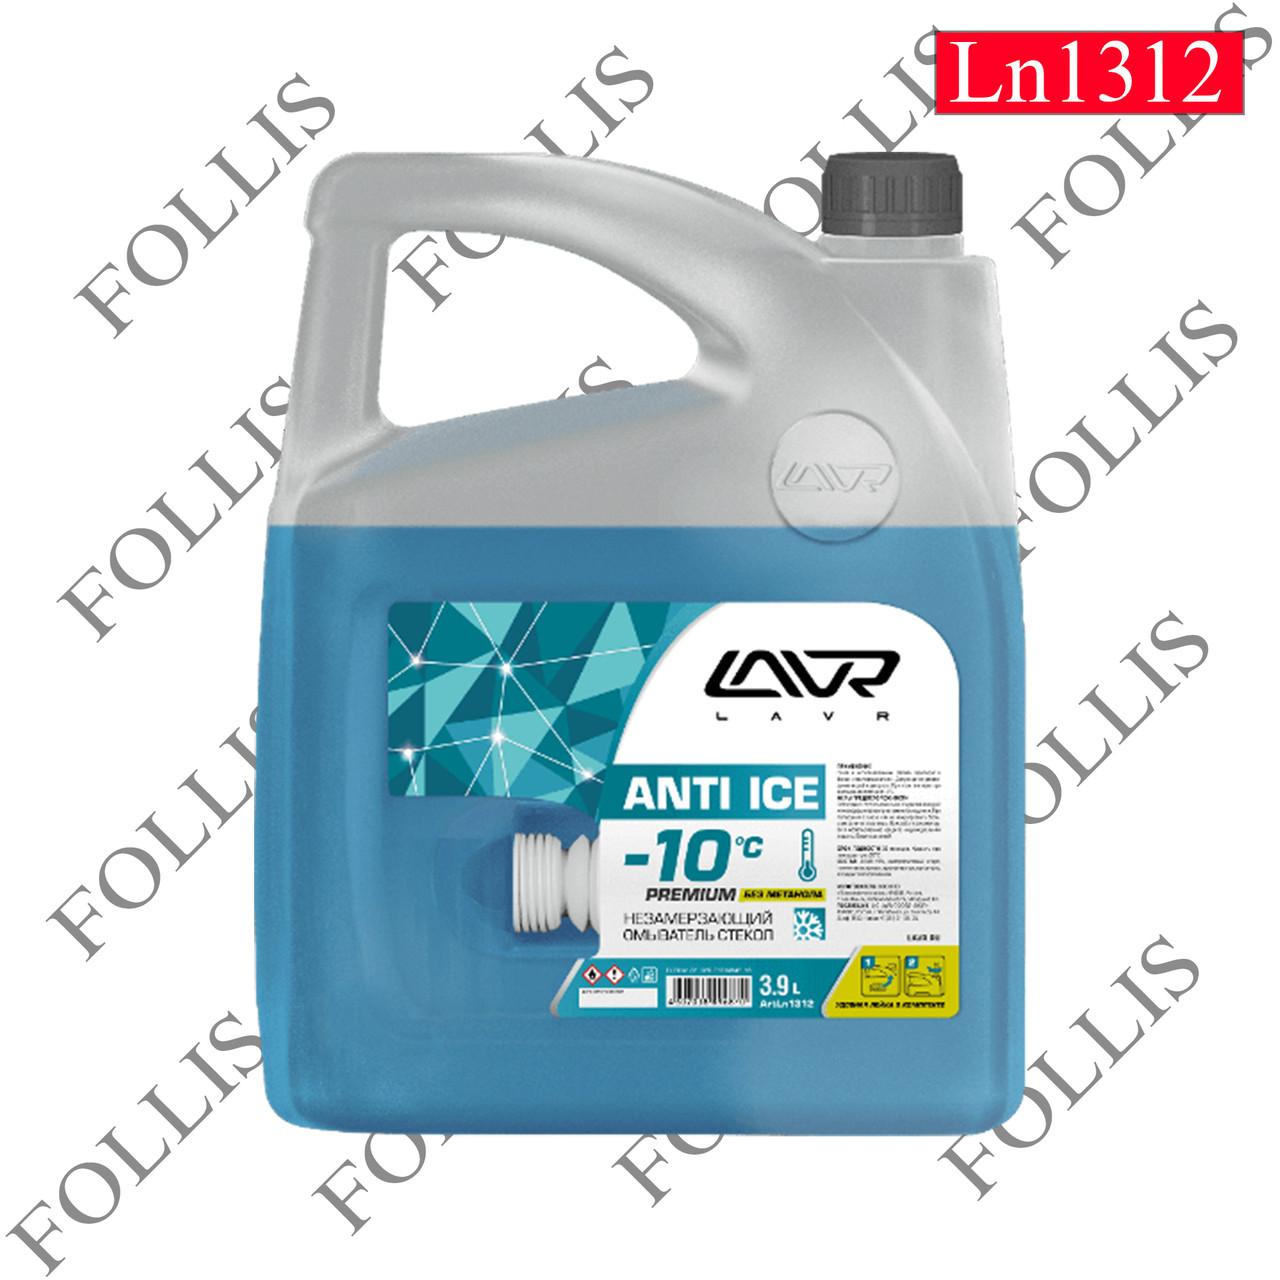 Незамерзающий омыватель стекол -10°С LAVR Anti-ice Premium 3,9 л